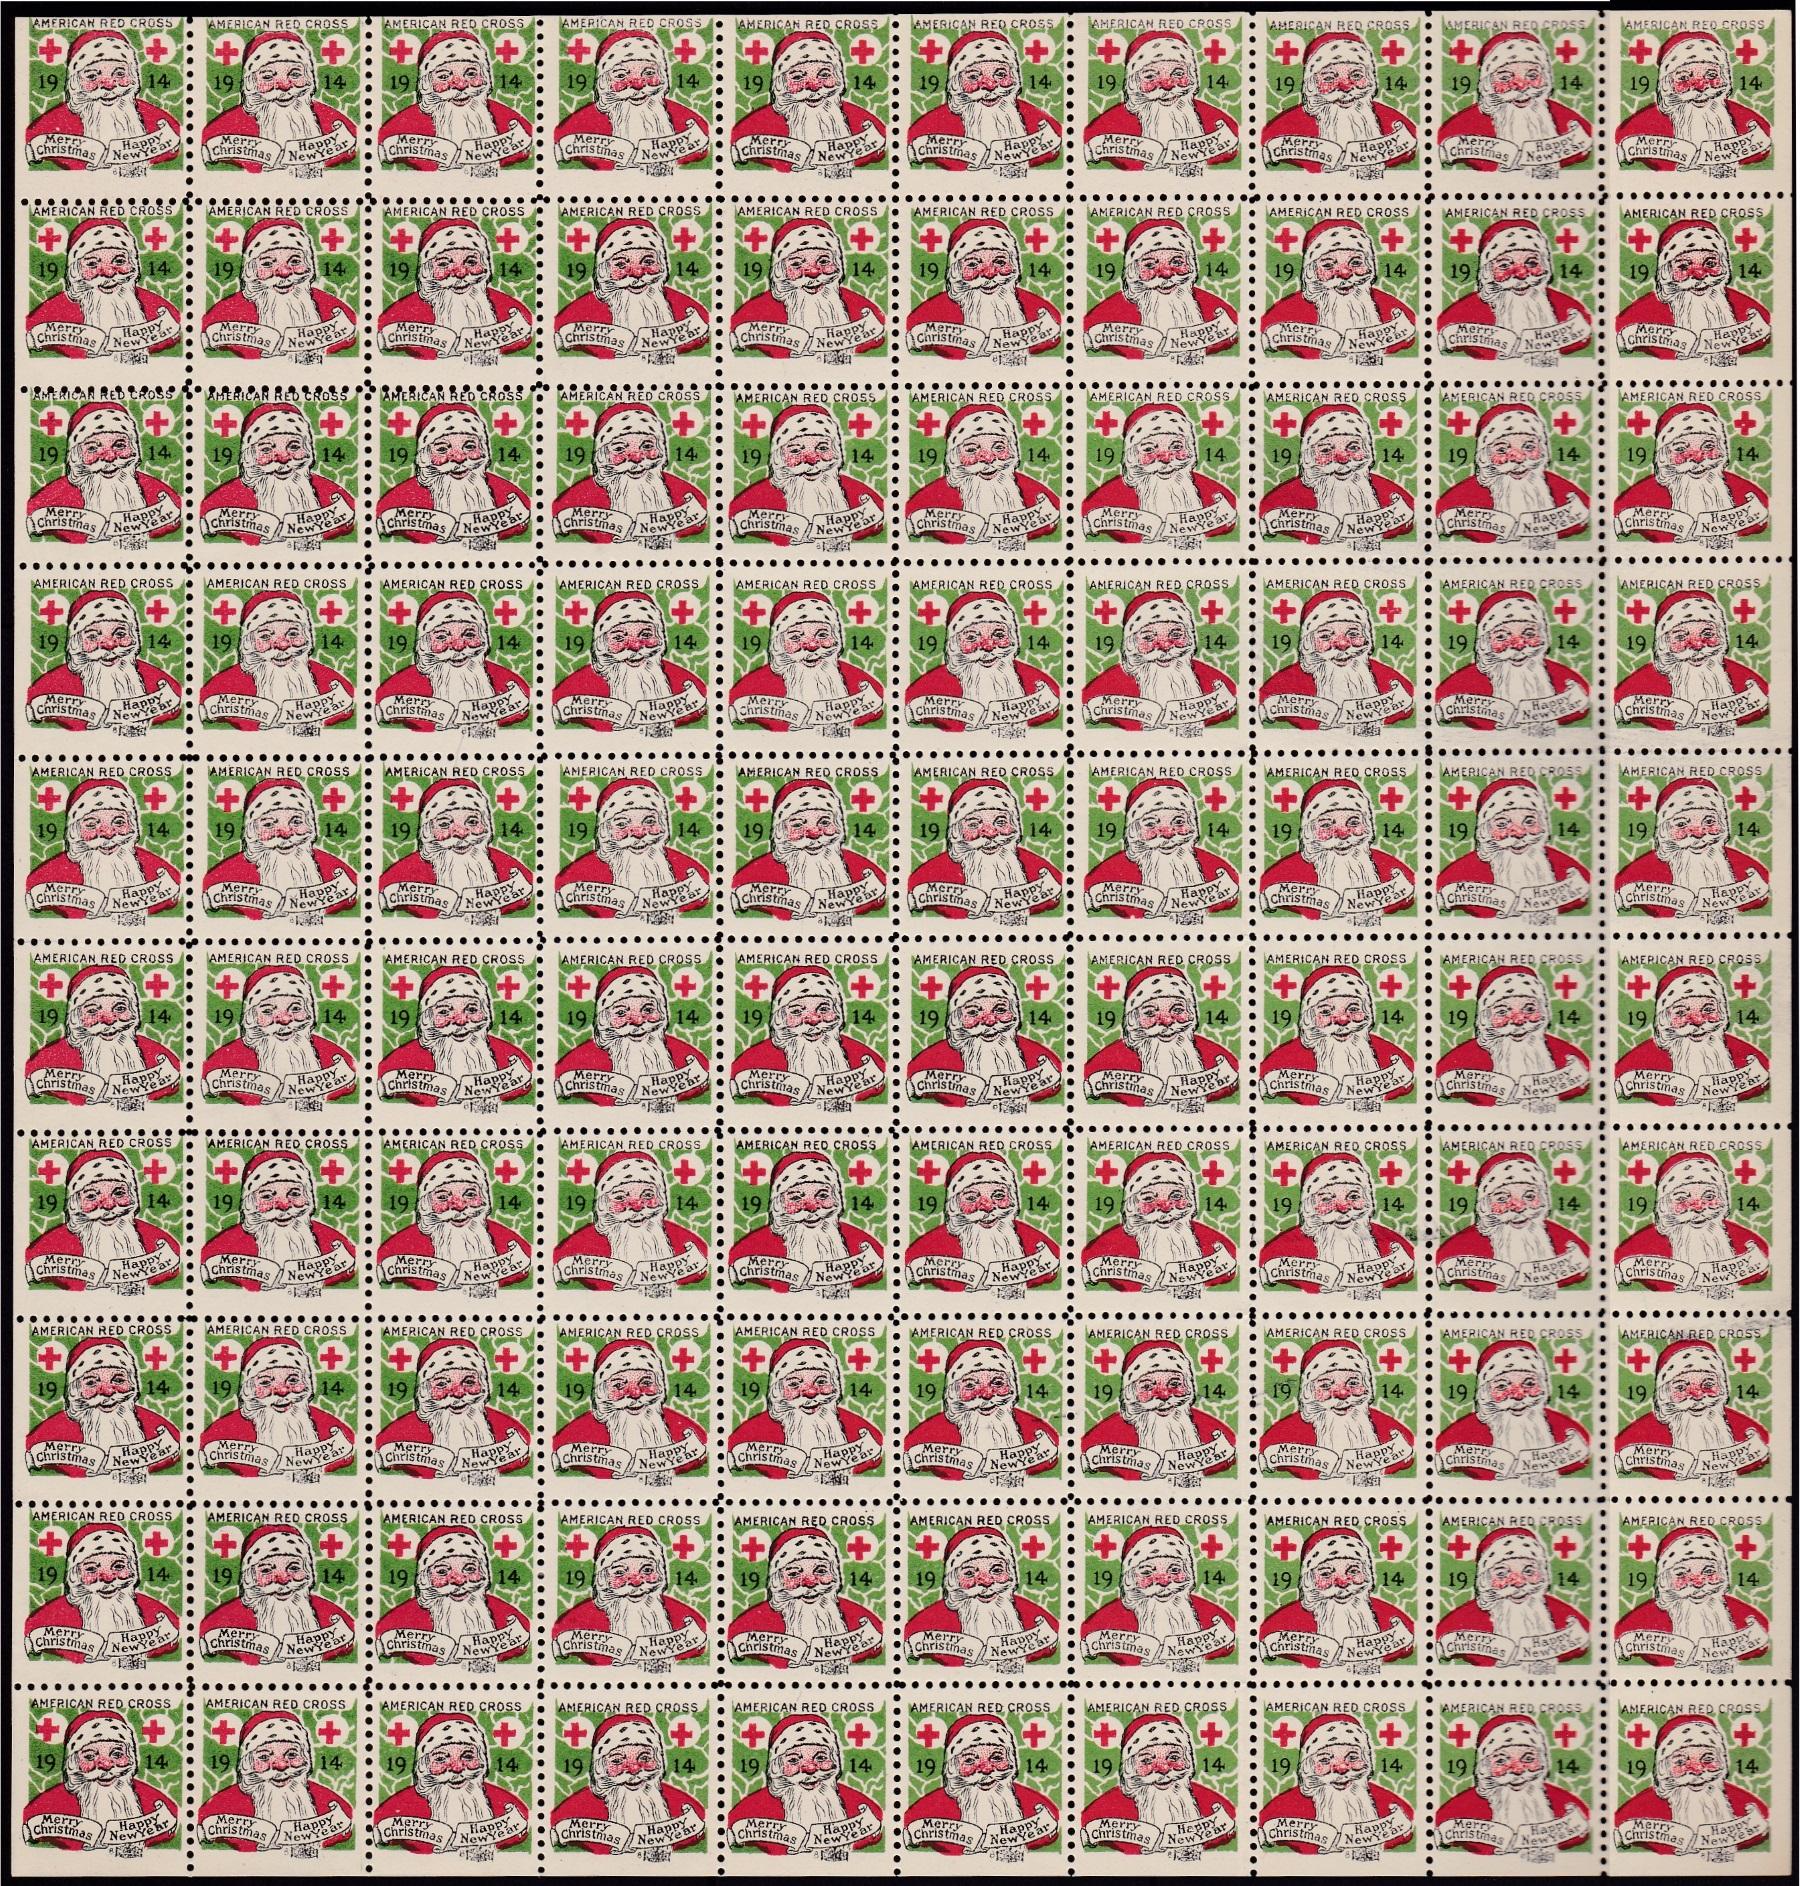 1914 Chicago Lookalike Christmas Seal Sheet,